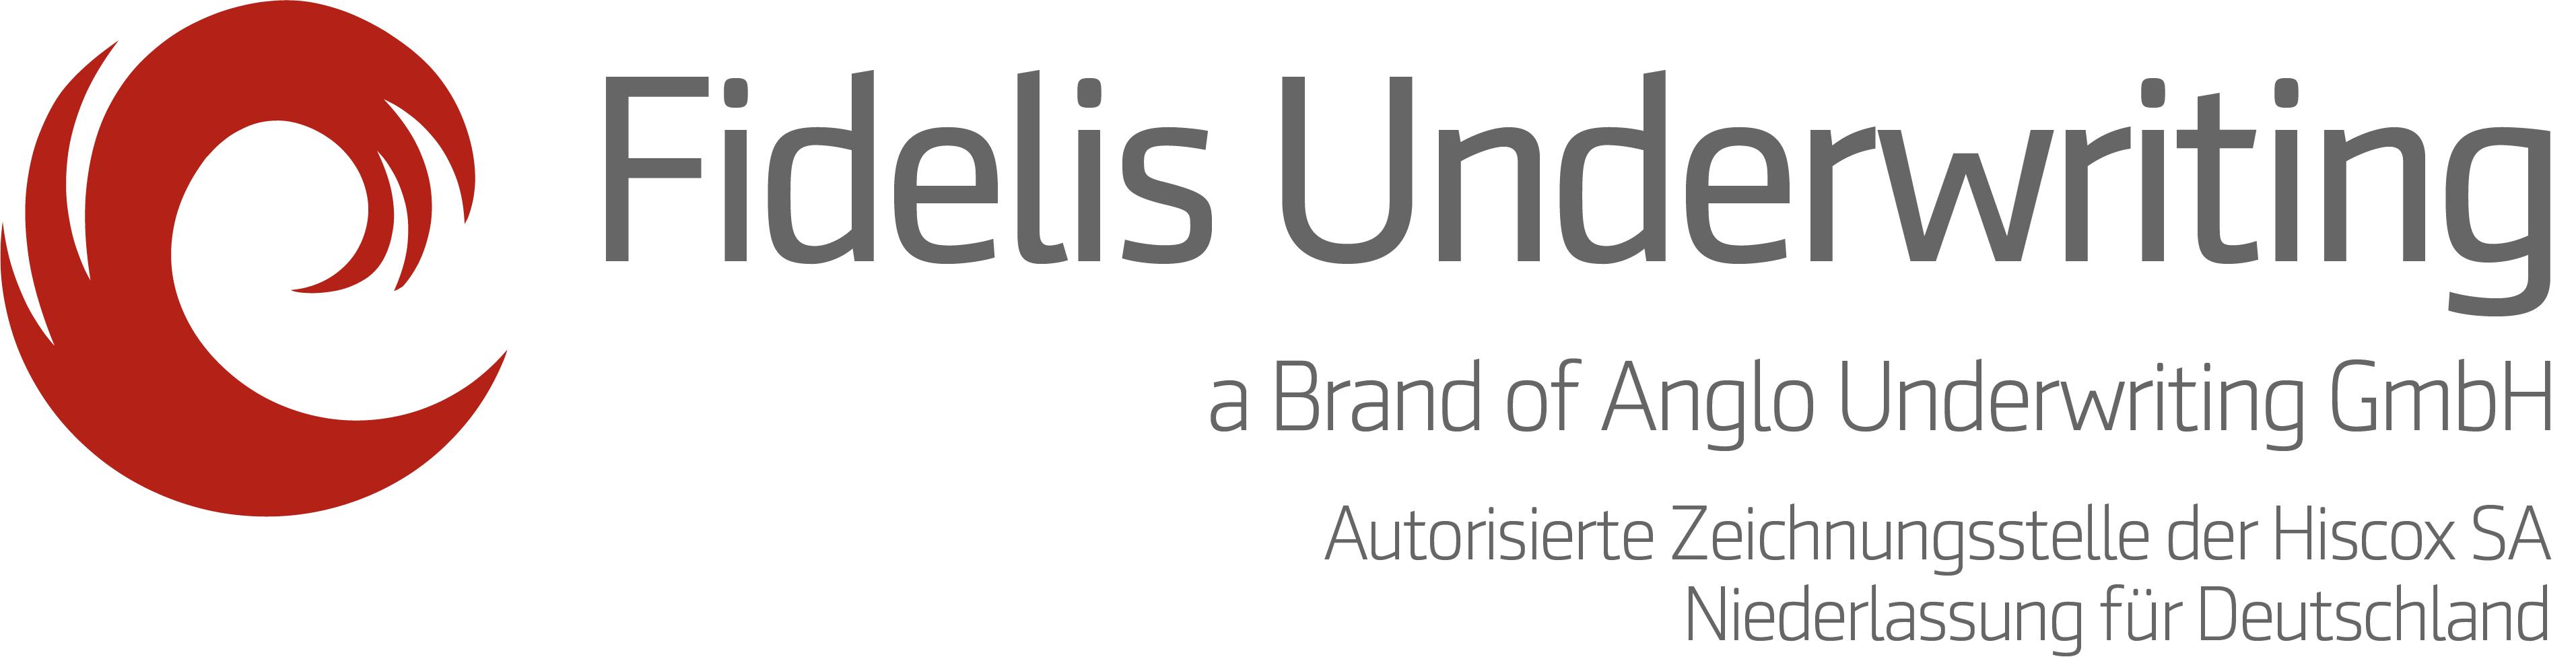 Fidelis a Brand of Anglo Underwriting in Vollmacht von Hiscox SA